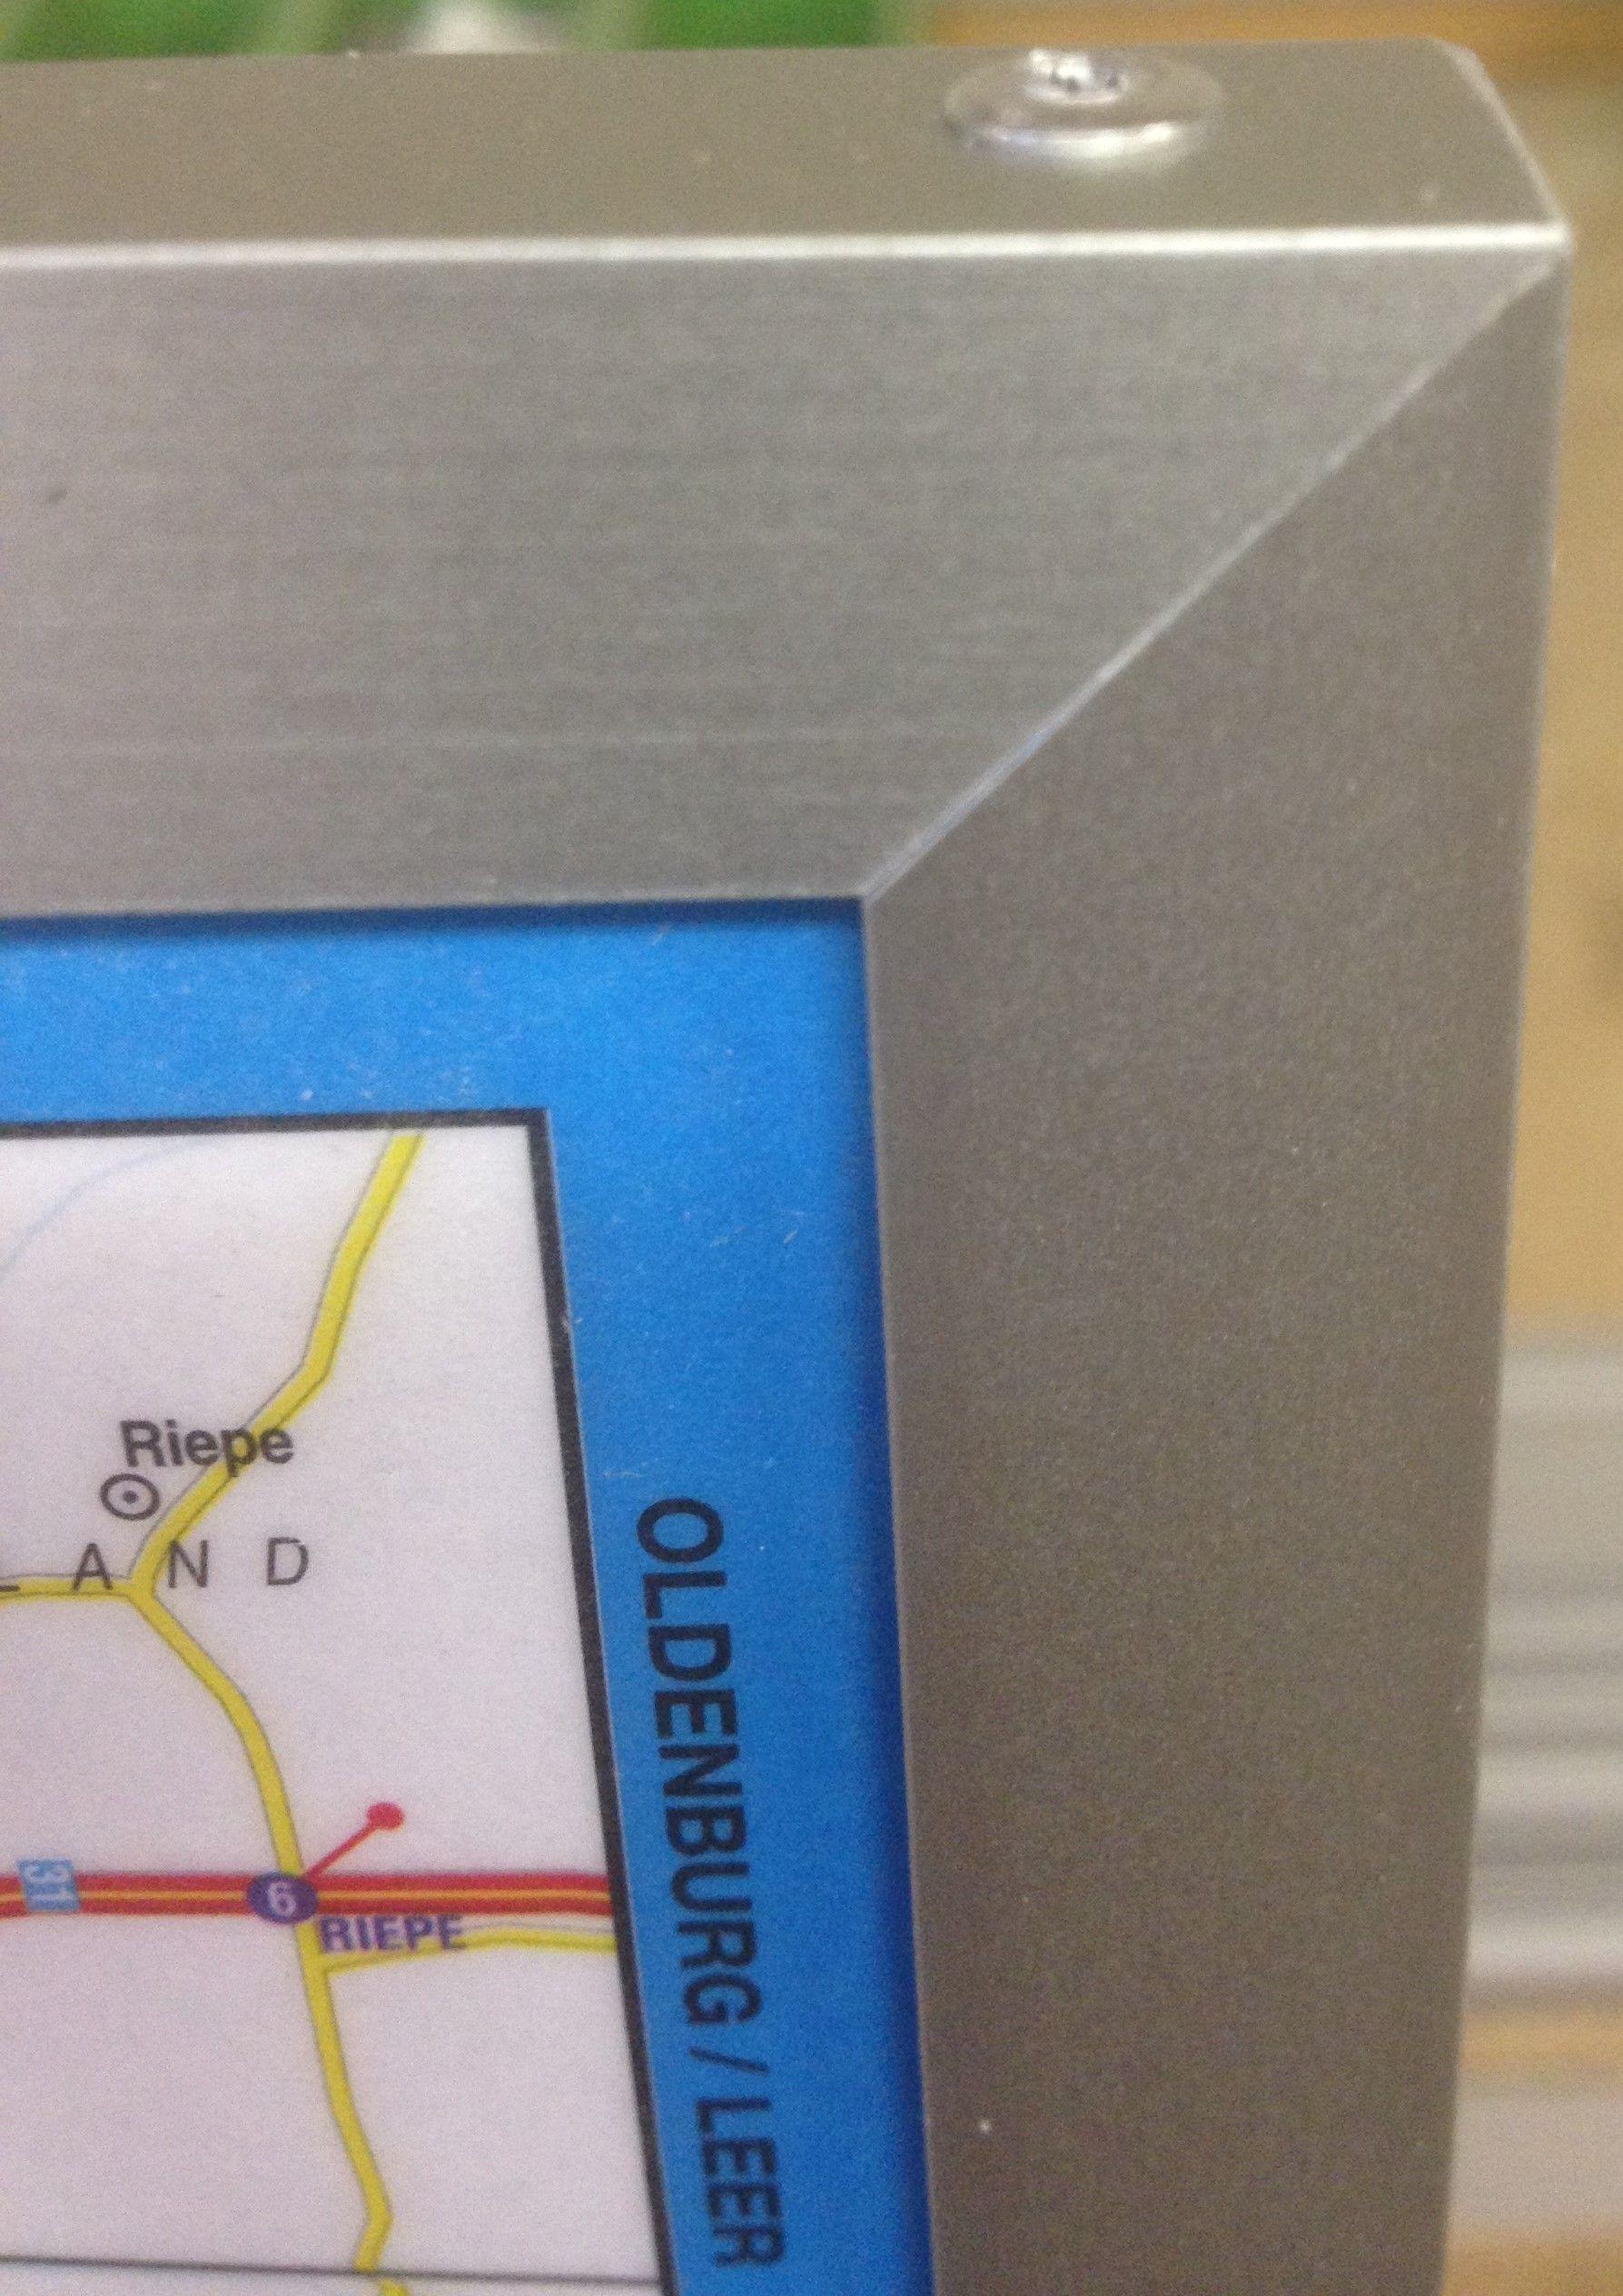 Landkaart Israel 1:250.000